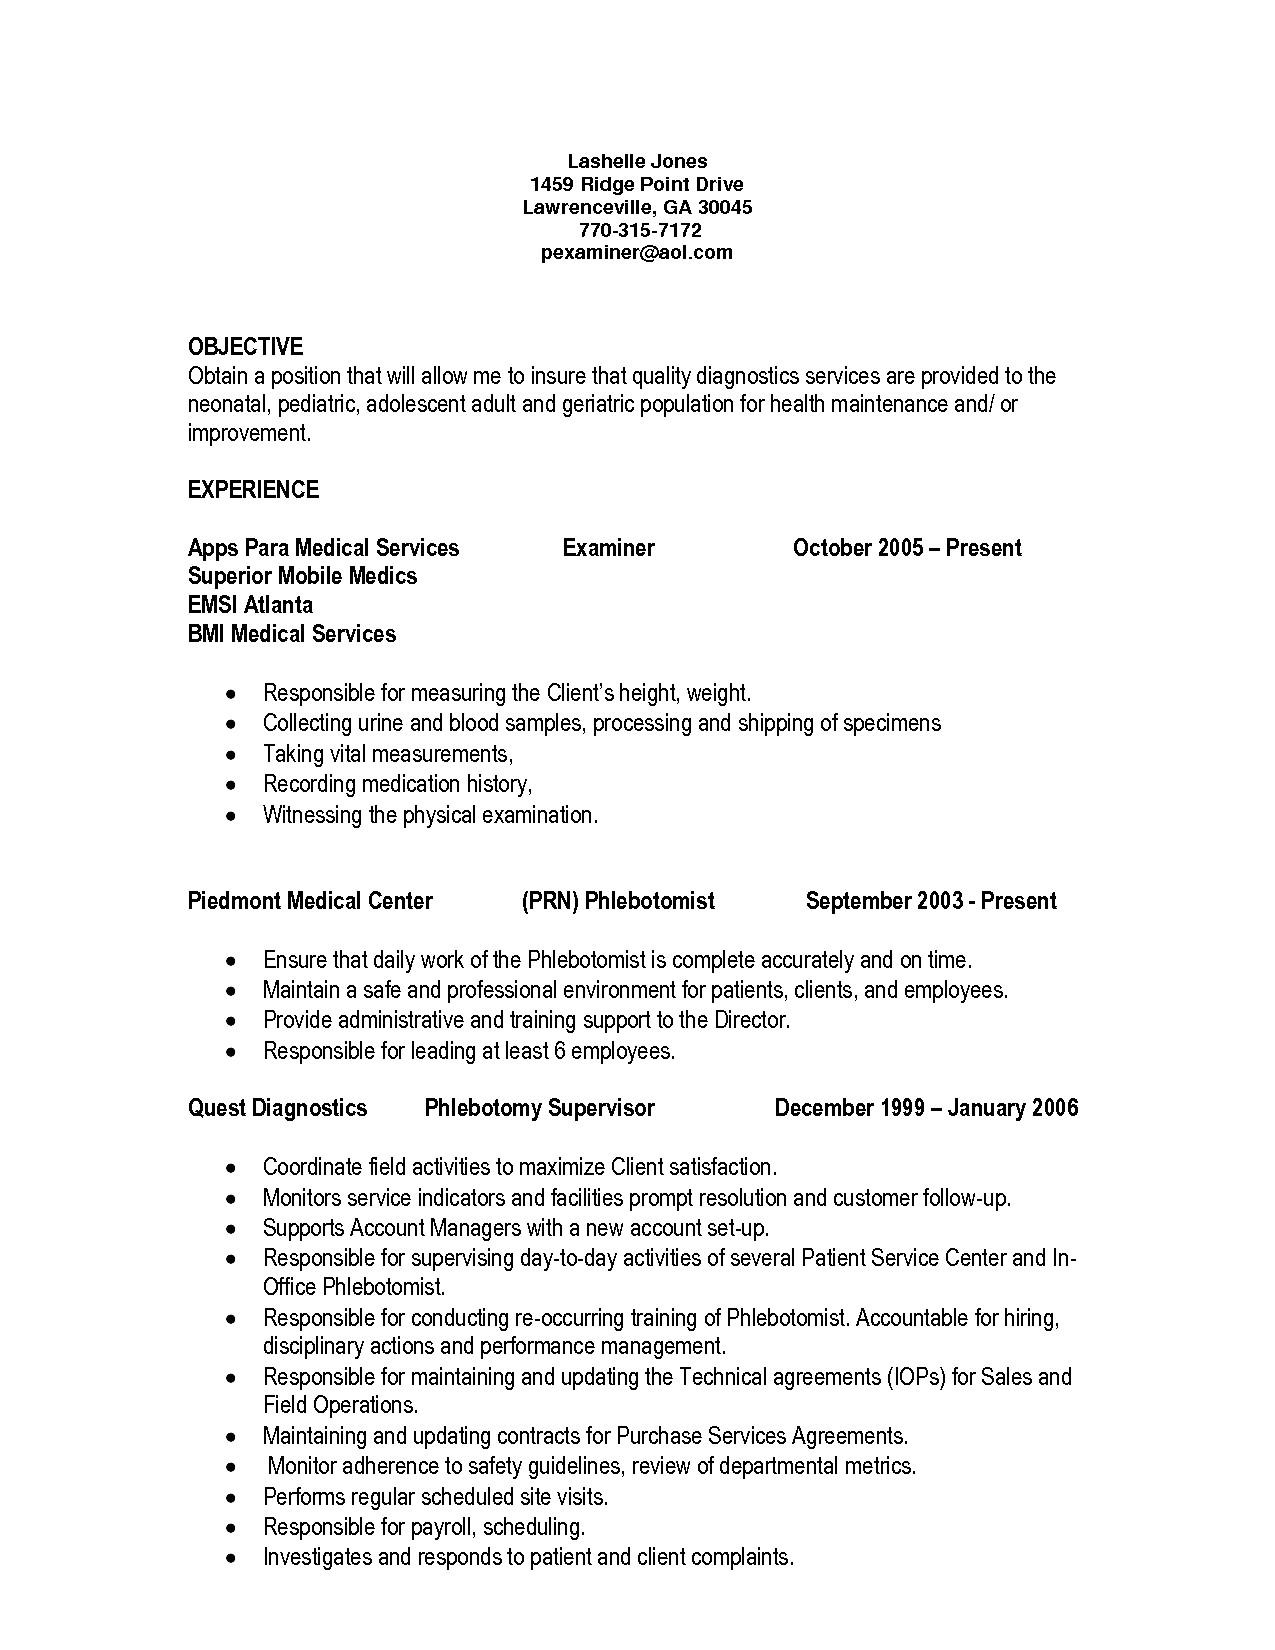 Free Phlebotomist Resume Templates Phlebotomy Resume Example Examples Of Resumes